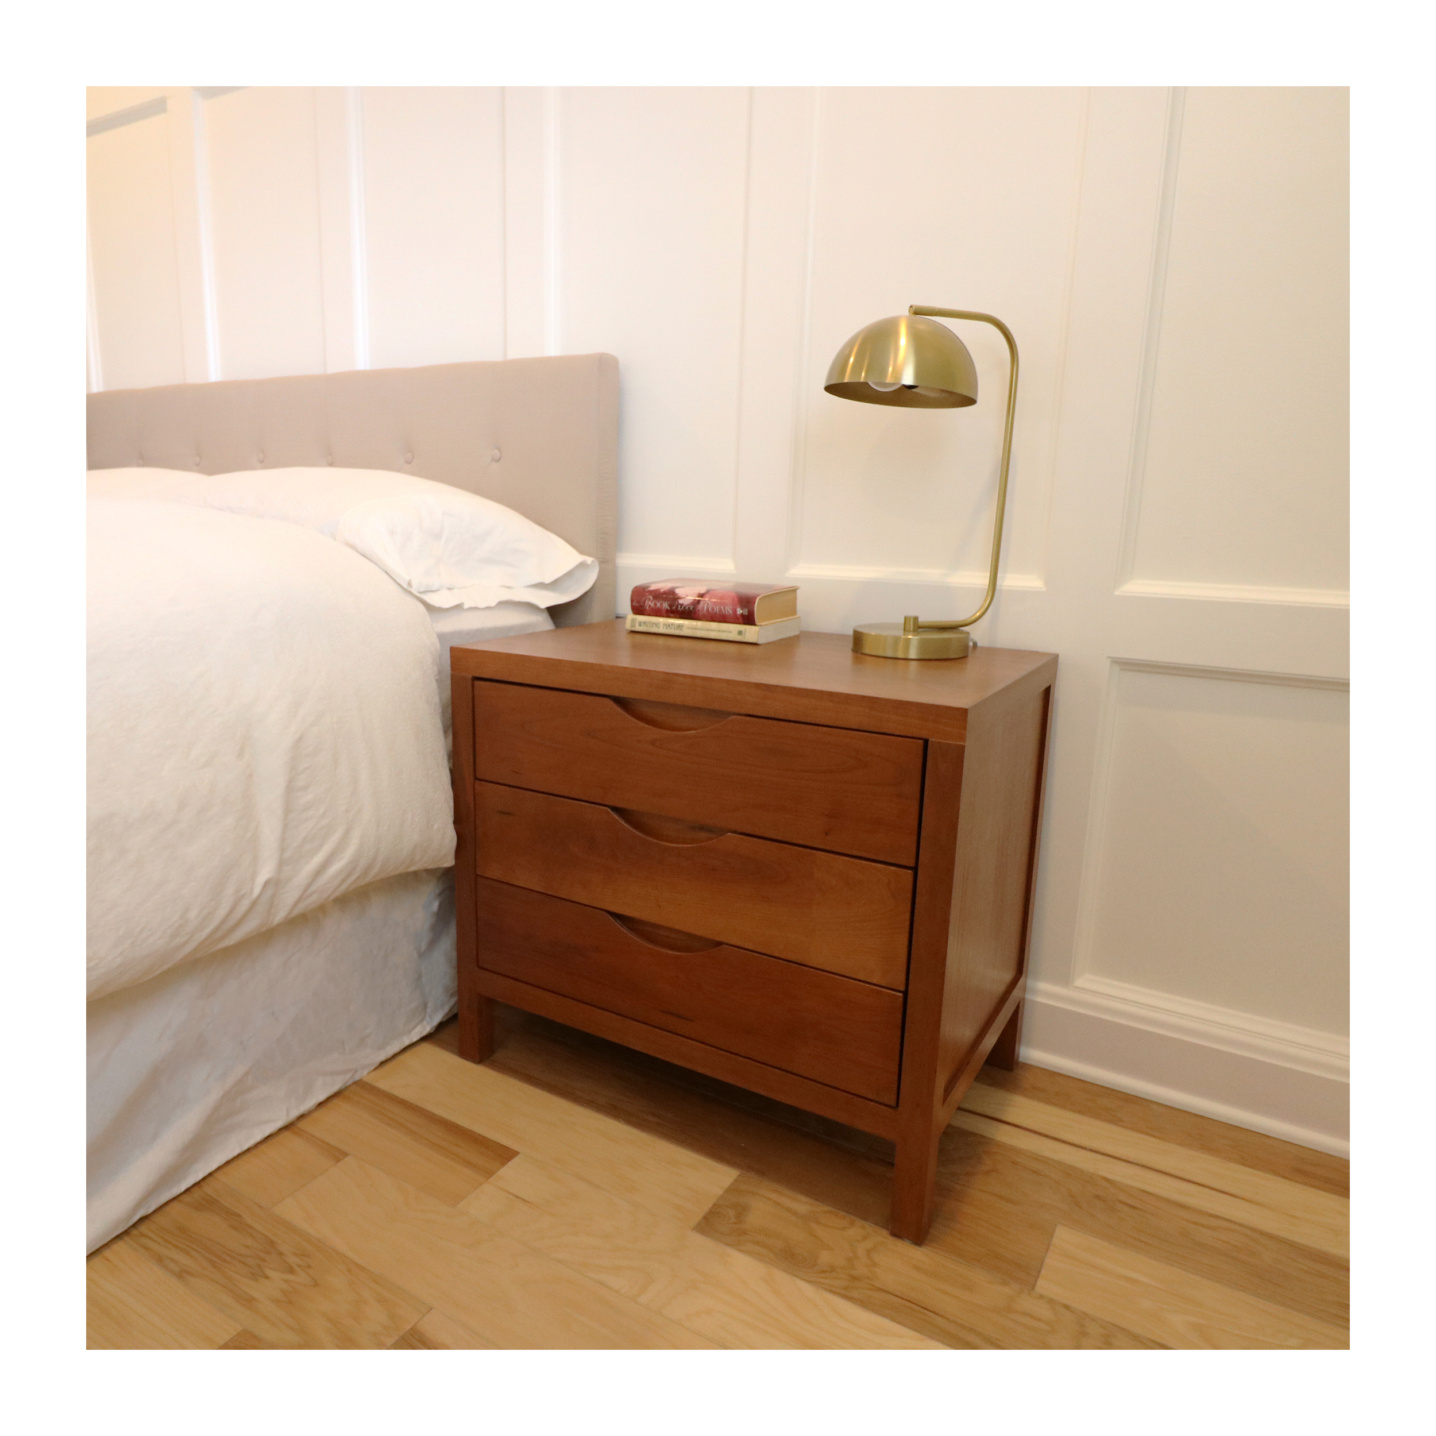 Solid cherry nightstand